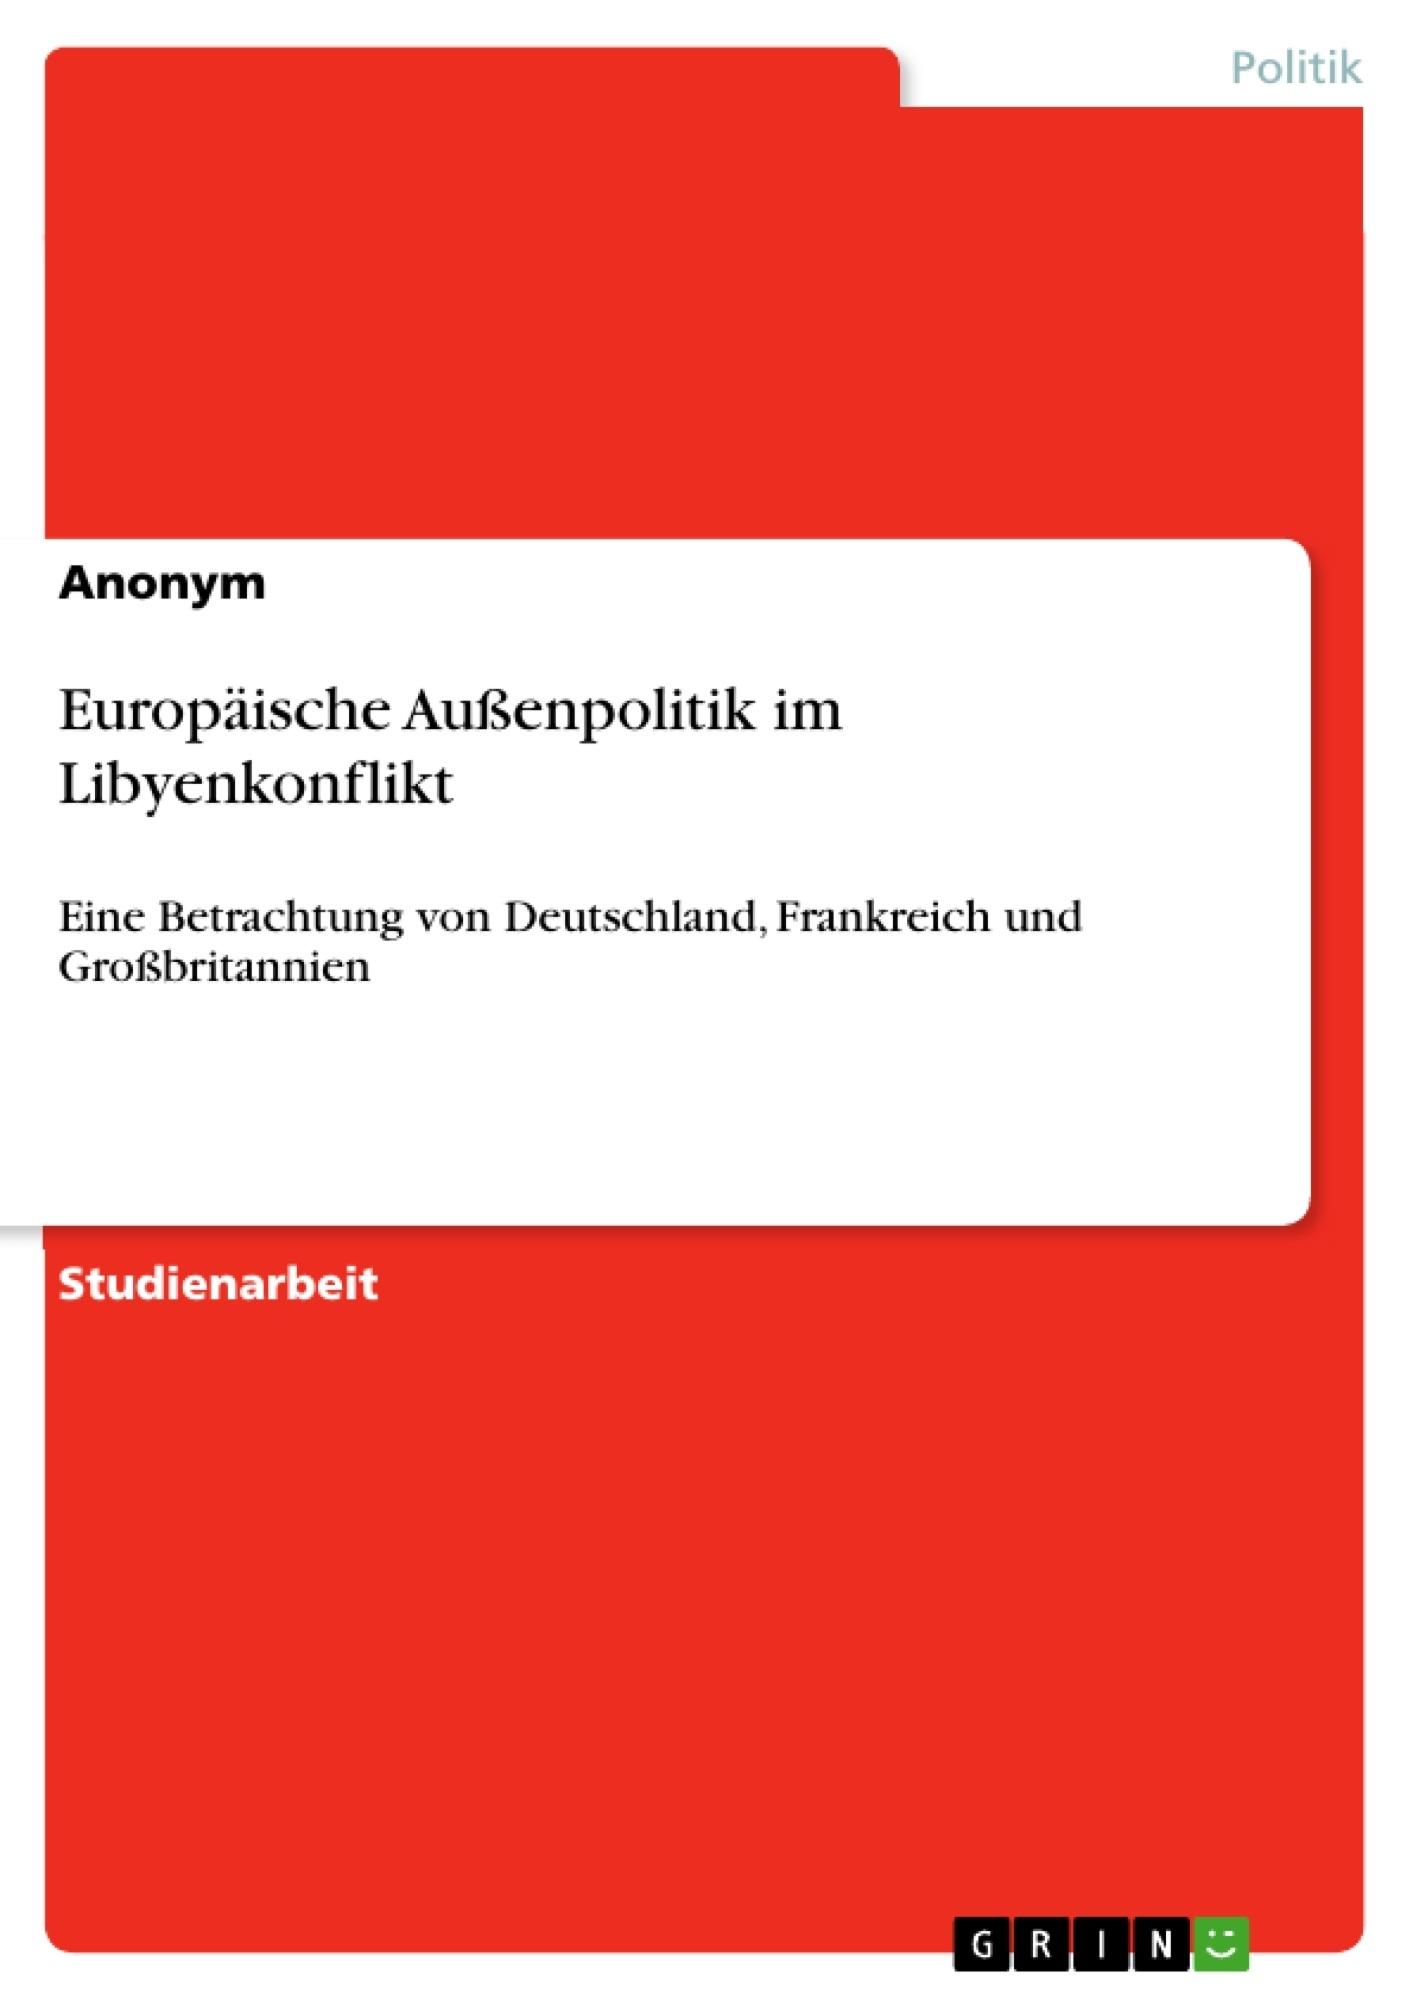 Titel: Europäische Außenpolitik im Libyenkonflikt